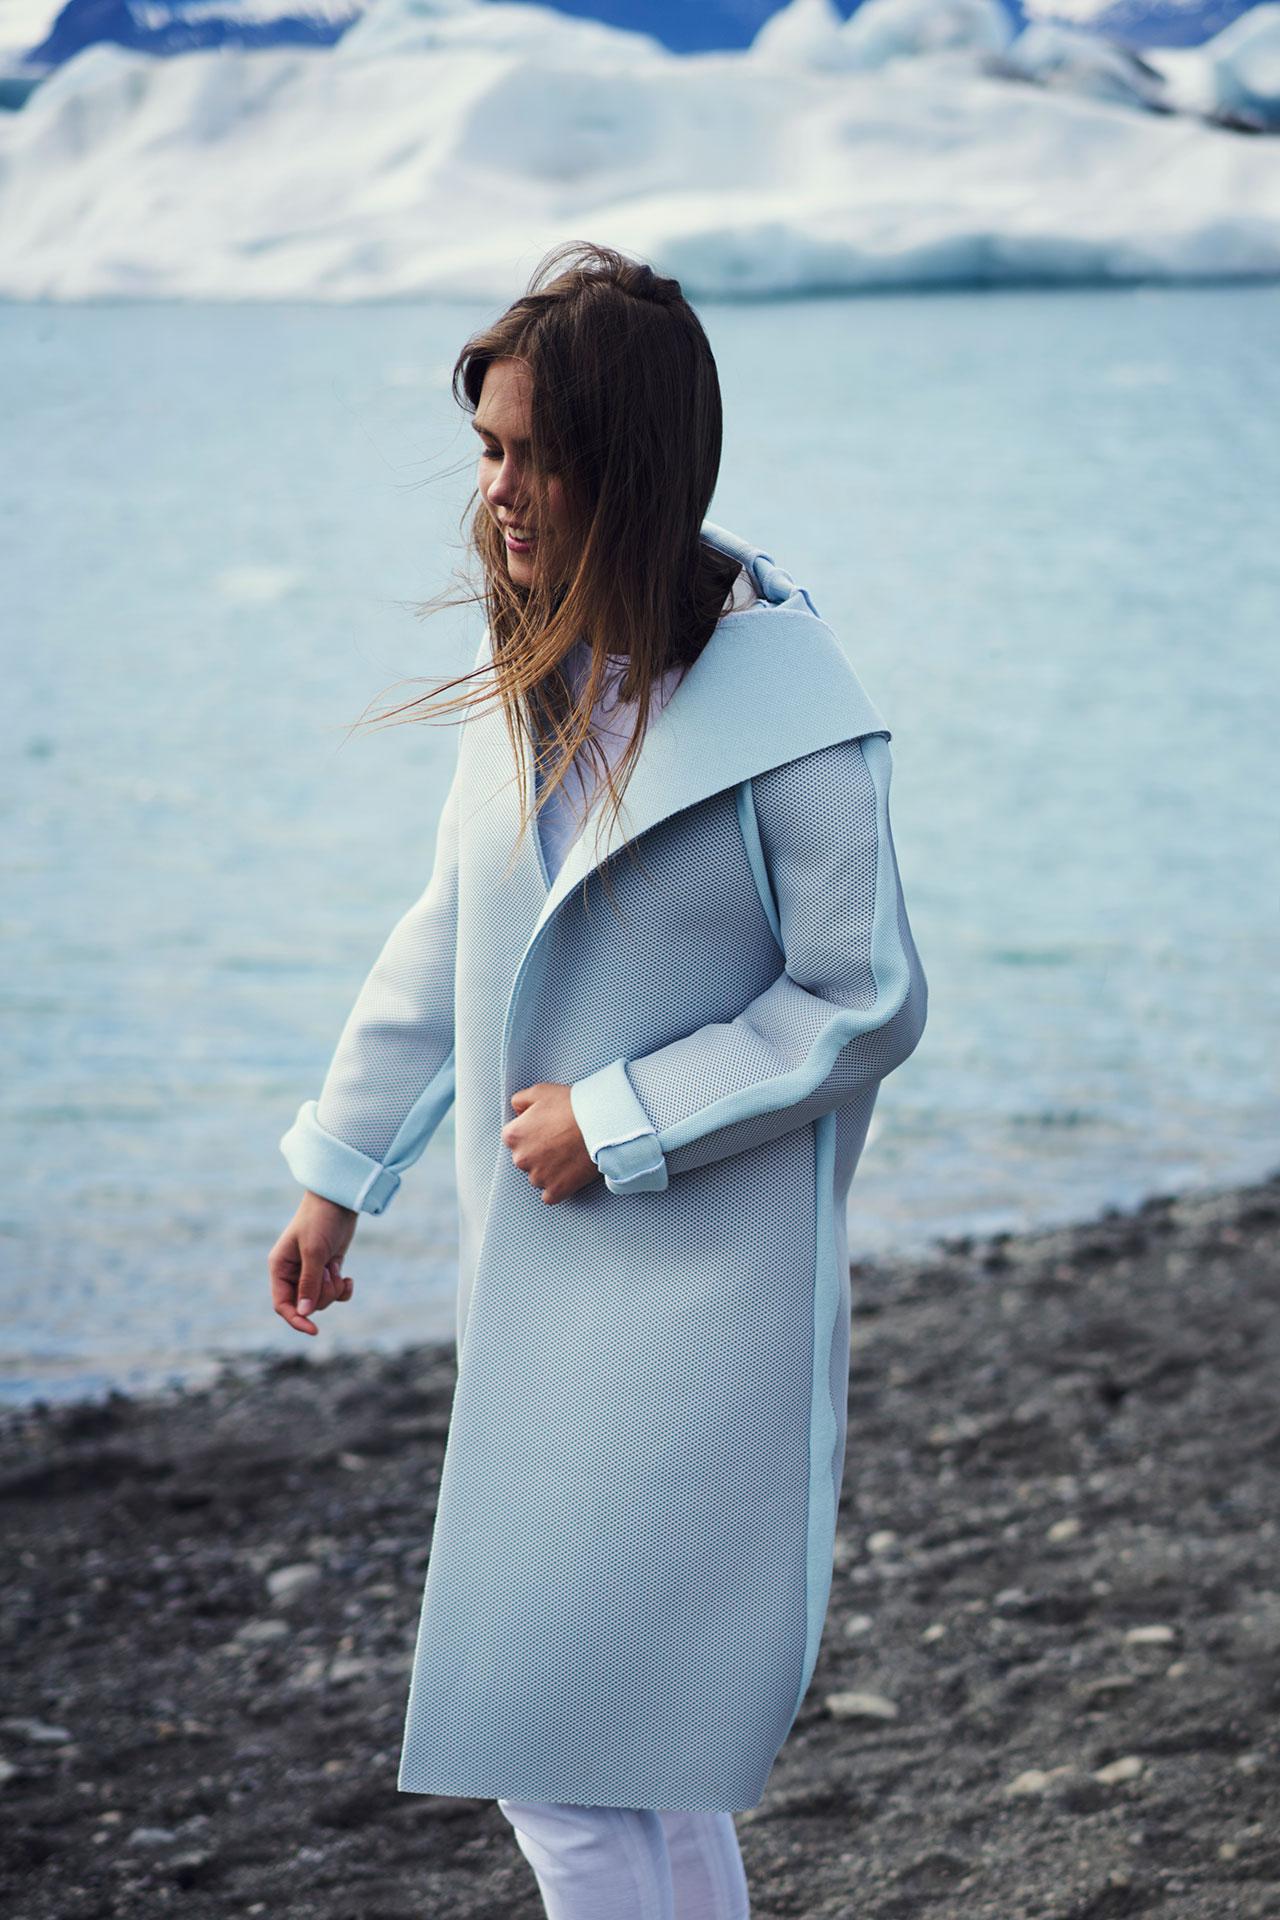 Félicie Eymard, Chrysalid Coat, from Metamorphosis Collection. Photo by Julien Hayard.